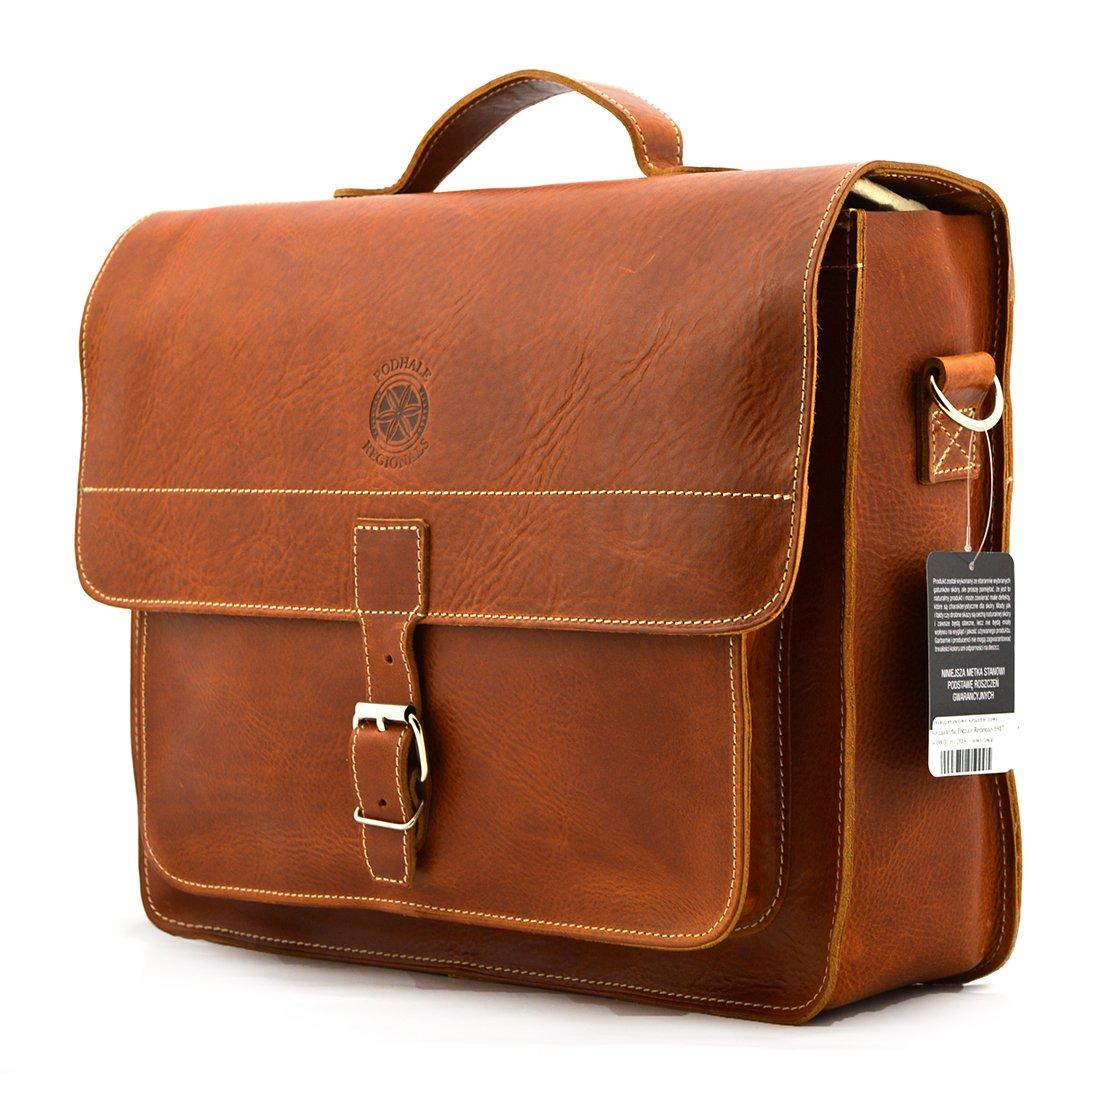 260819c864a2e Klasyczna torba Podhale Regionals b917 koniak - Skóra juchtowa premium    Koniak - Kup teraz Online